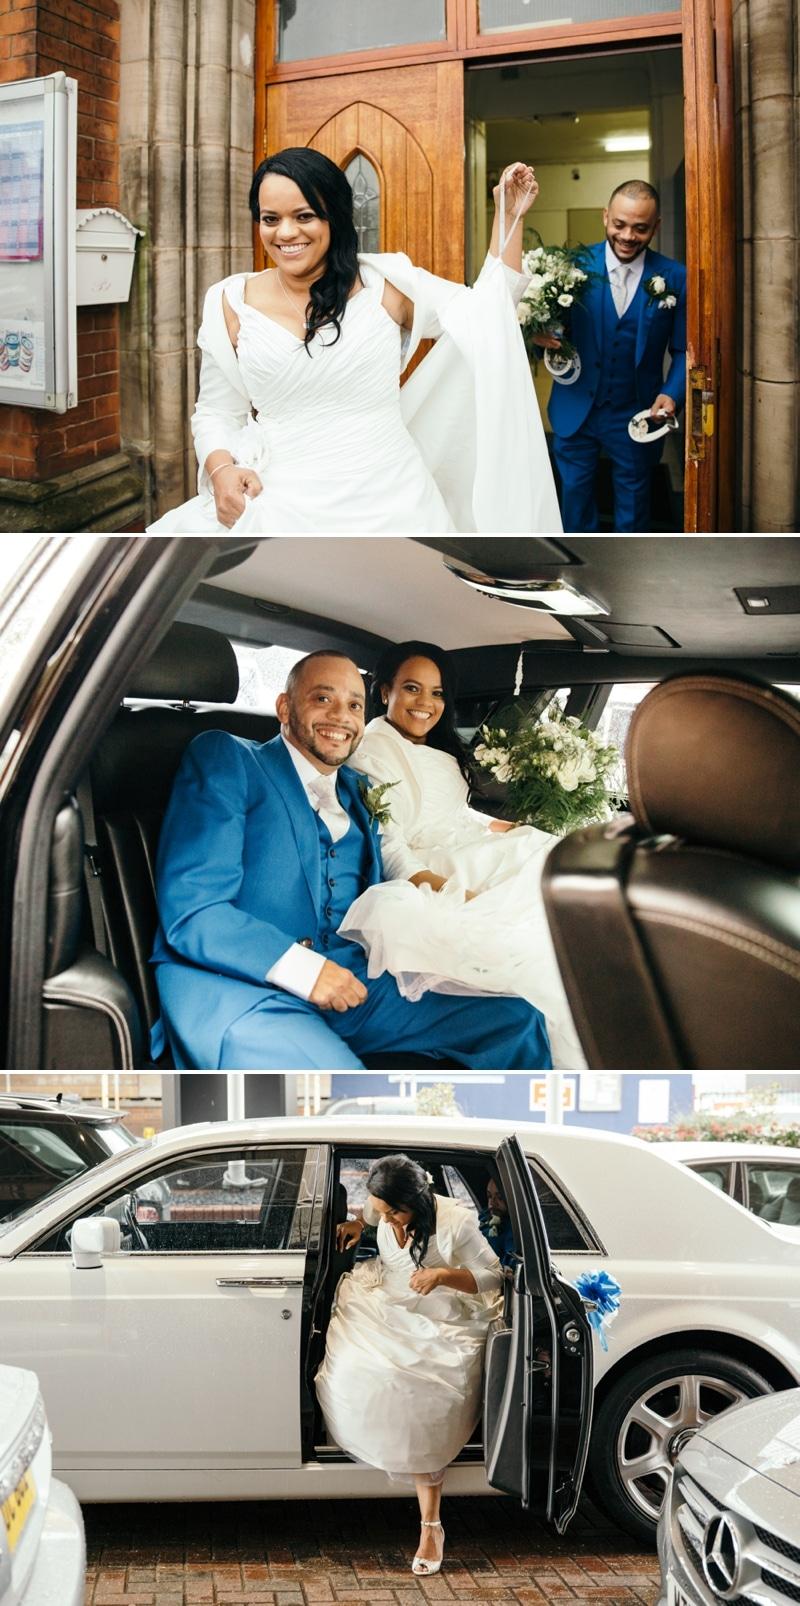 wedding-photographer-birmingham-church-hyatt-hotel-photos (68 of 118).jpg